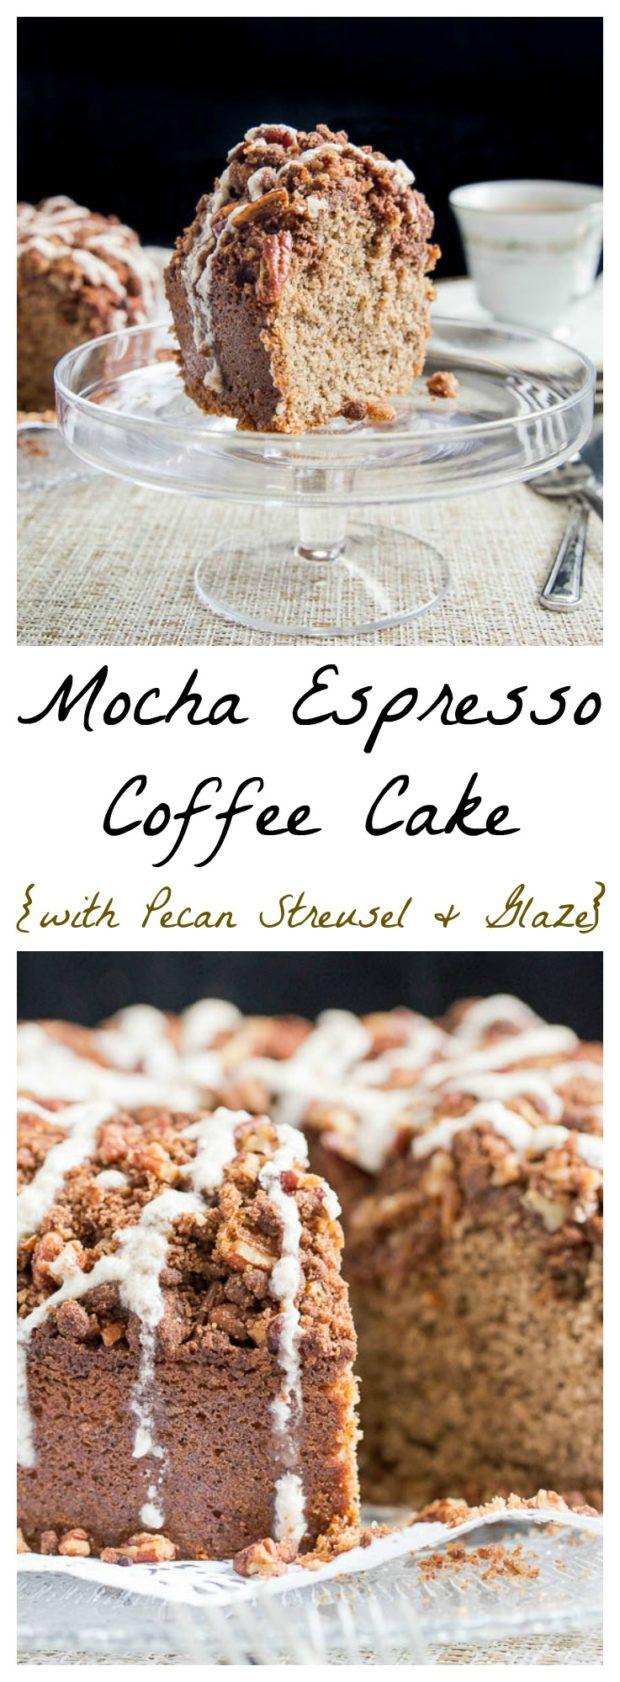 Mocha Espresso Coffee Cake